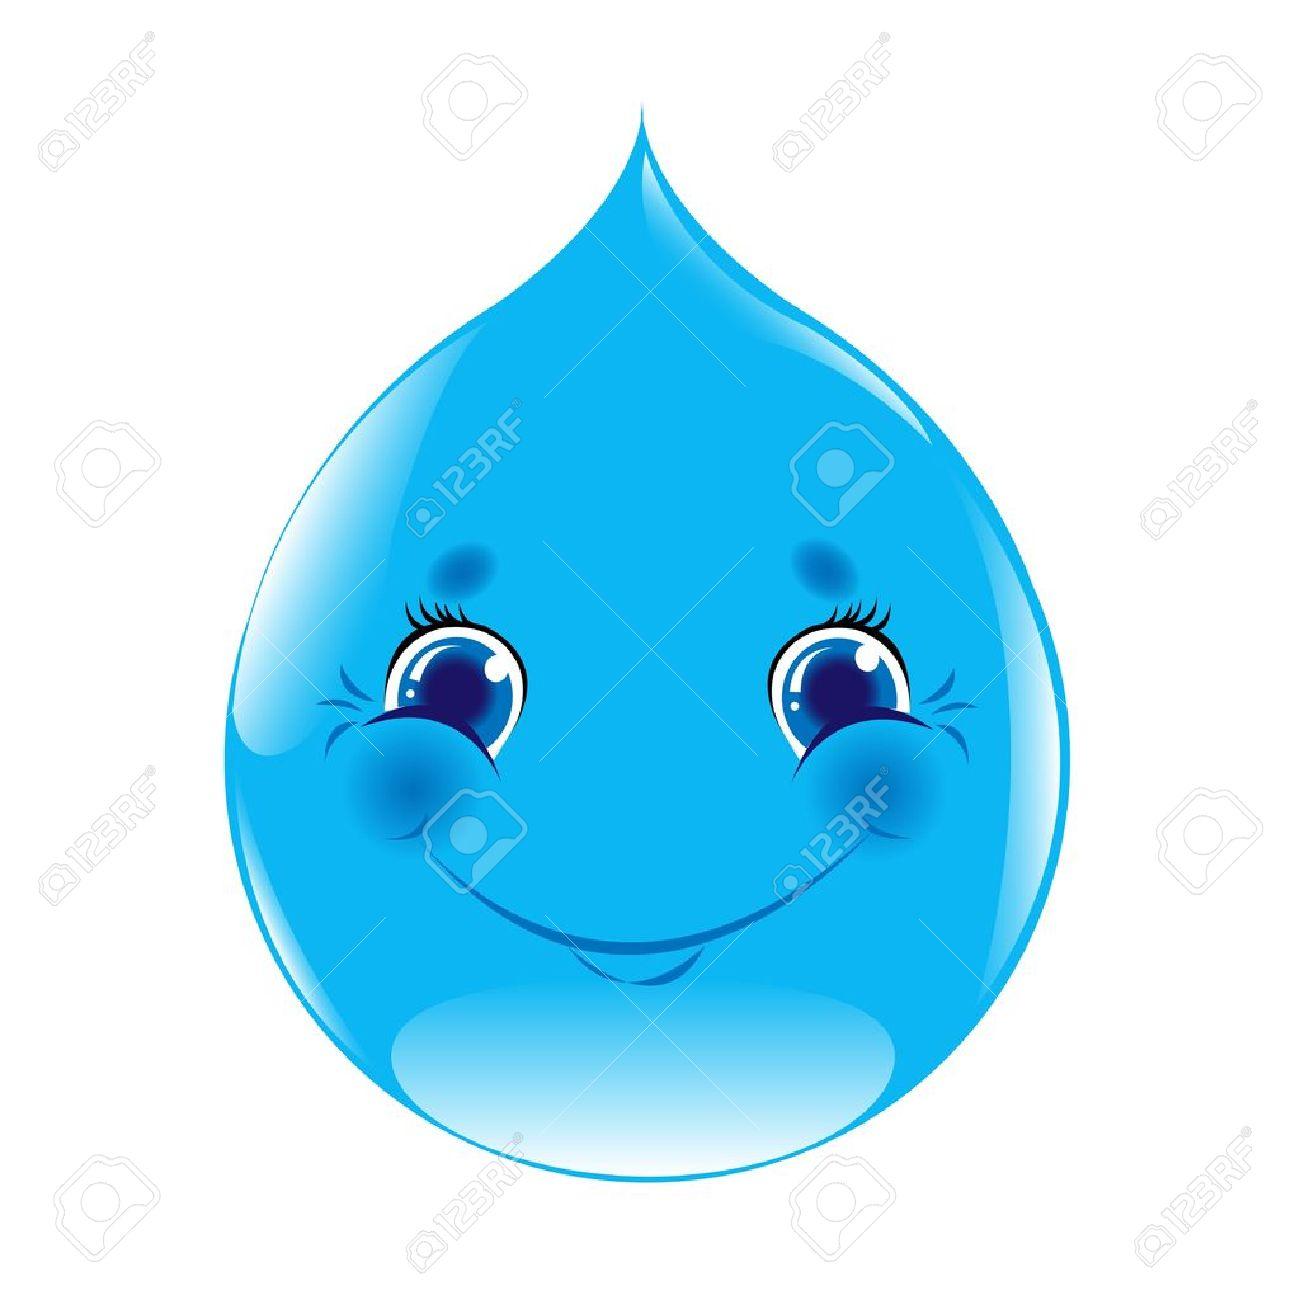 Gota De Agua De Dibujos Animados Aislado En Fondo Blanco